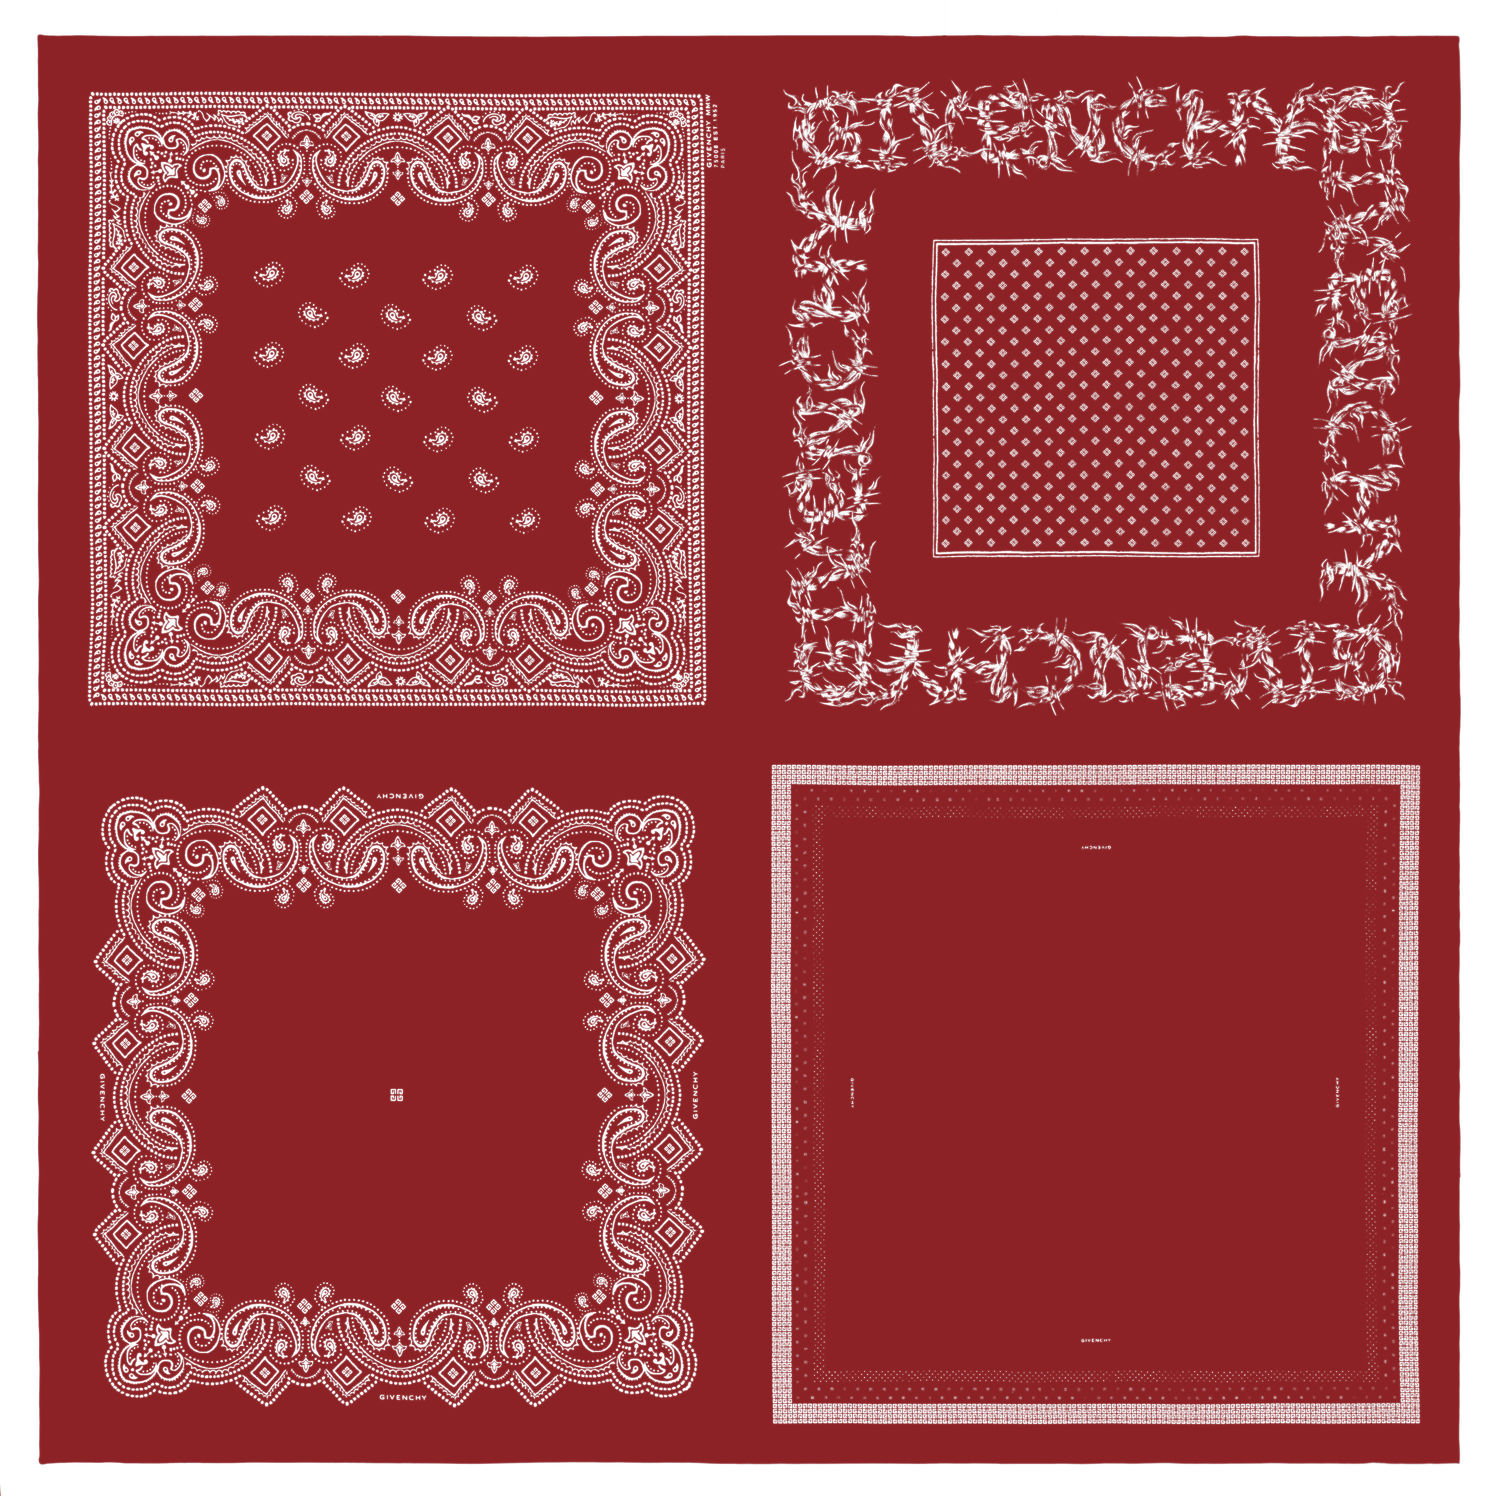 PRINTED BANDANA IN RED - THE EDGE SINGAPORE